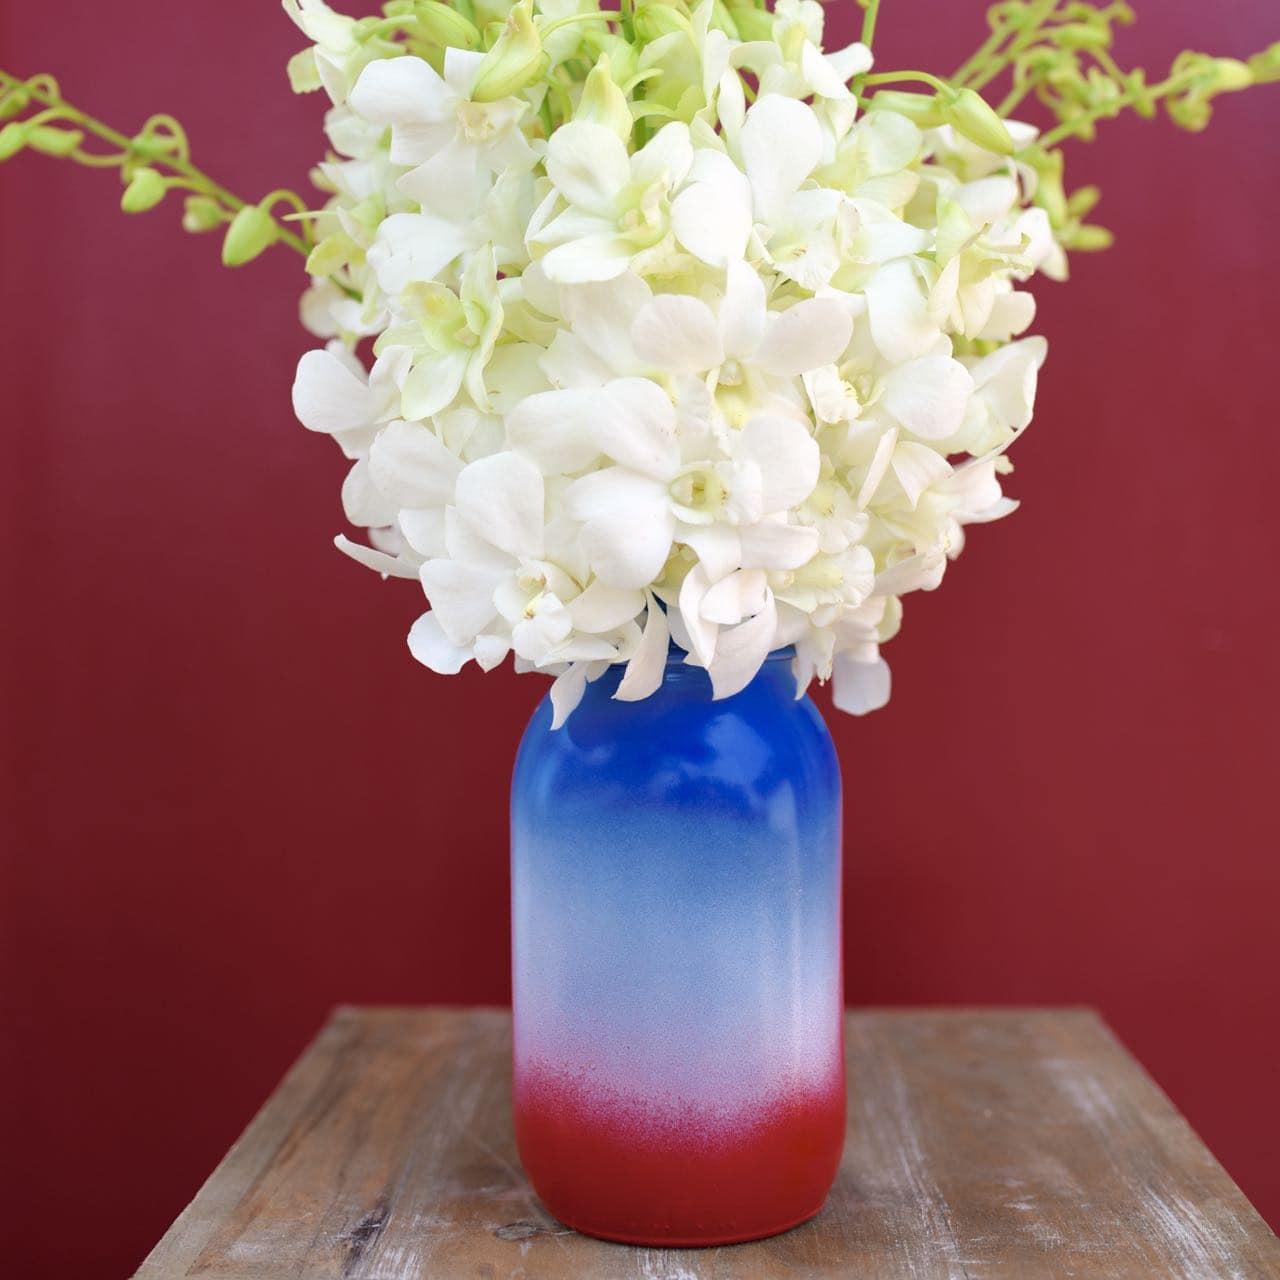 Patriotic mason jar vase DIY for the Fourth of July